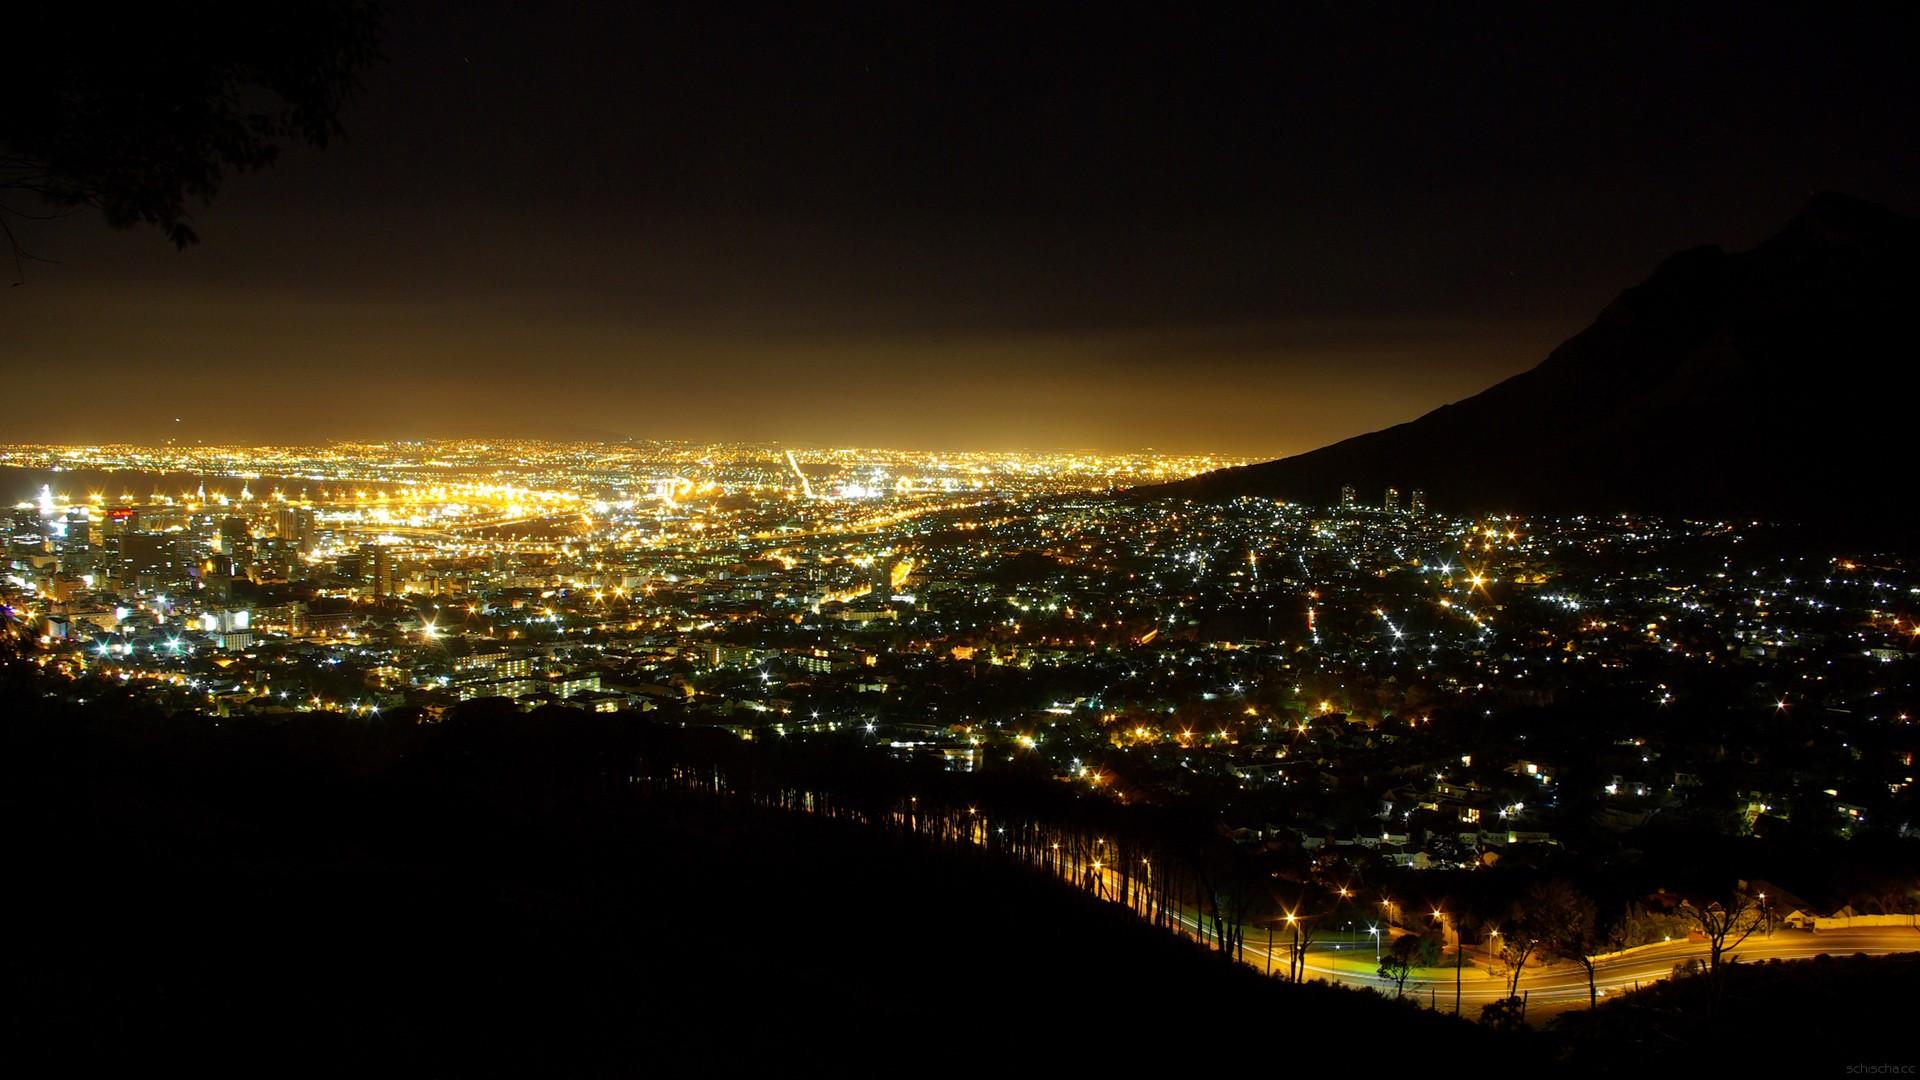 Wallpaper Pemandangan Lampu Cityscape Kaki Langit Horison